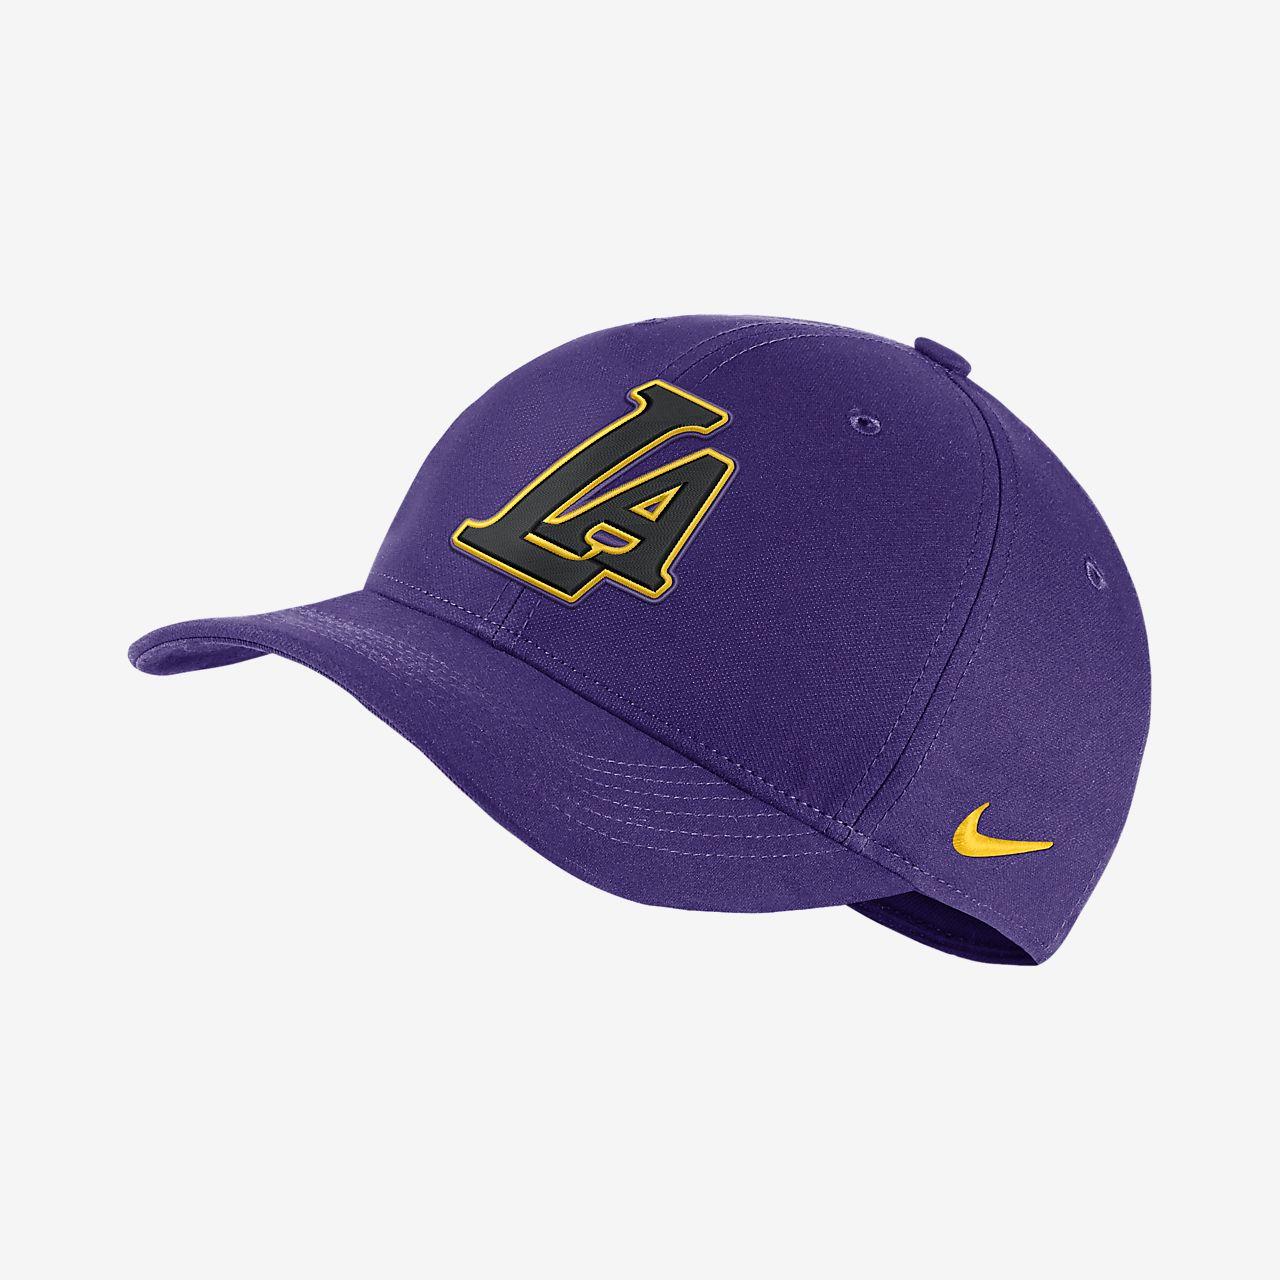 395c680b0 Los Angeles Lakers City Edition Nike AeroBill Classic99 NBA Hat ...